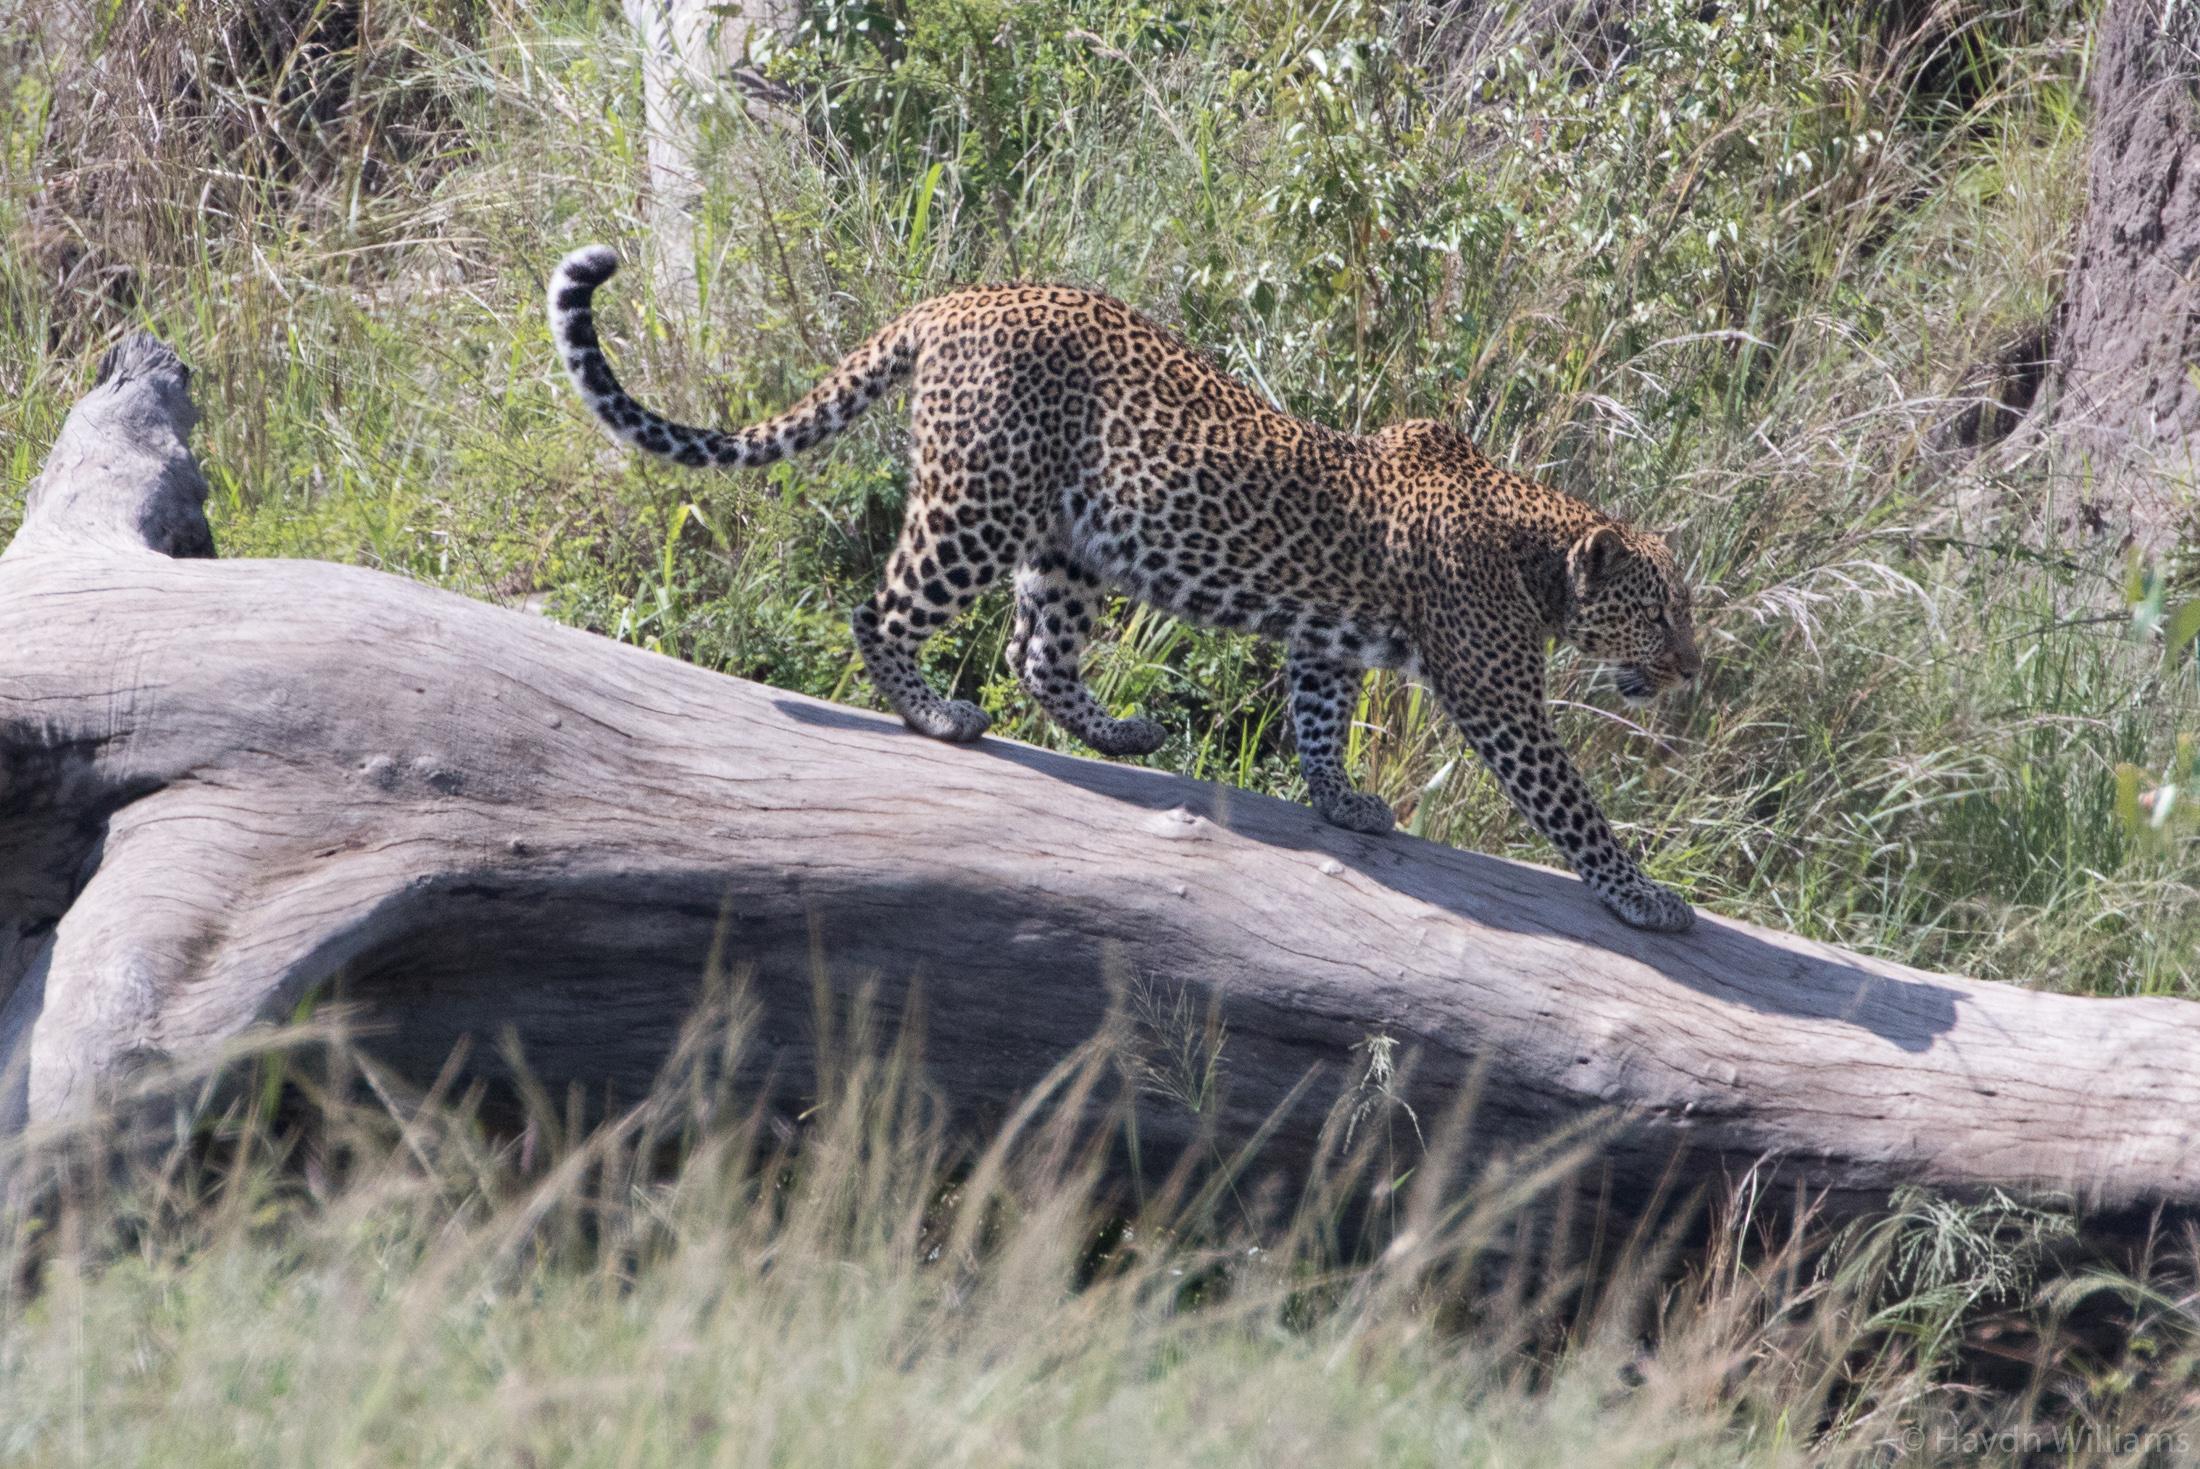 Panthera pardus (leopard). © Haydn Williams 2019